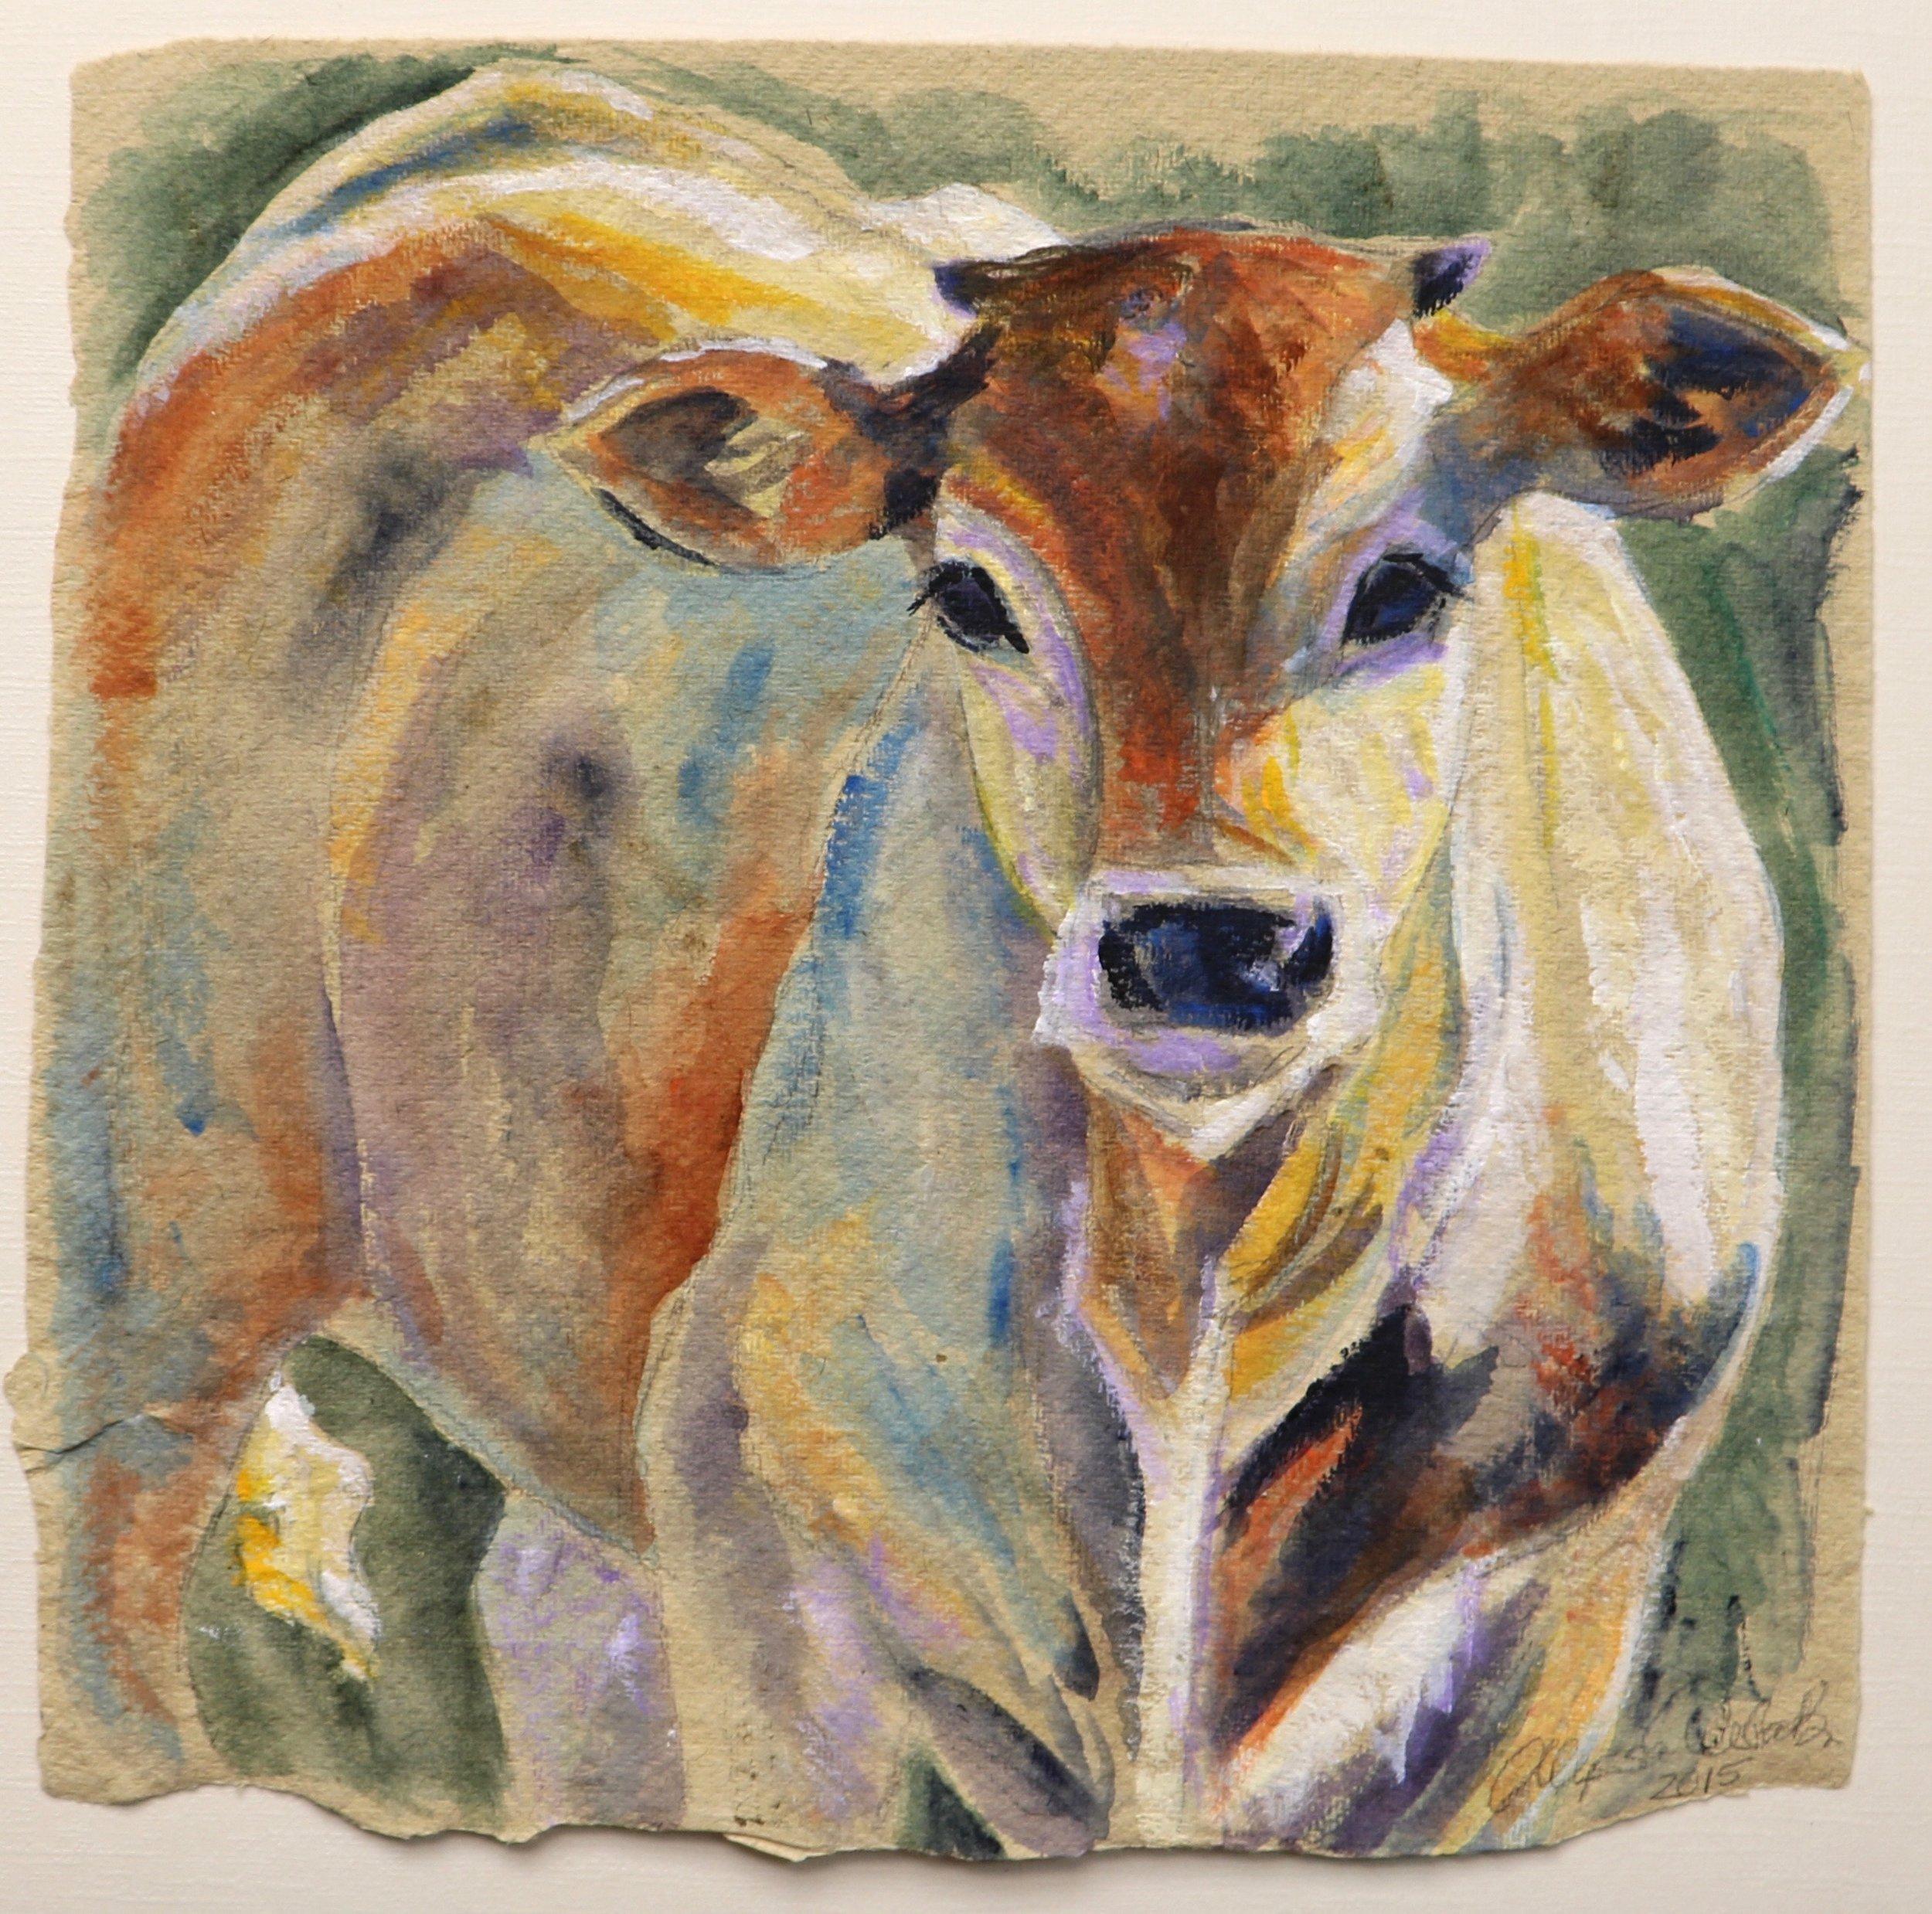 Calf in the Sunlight